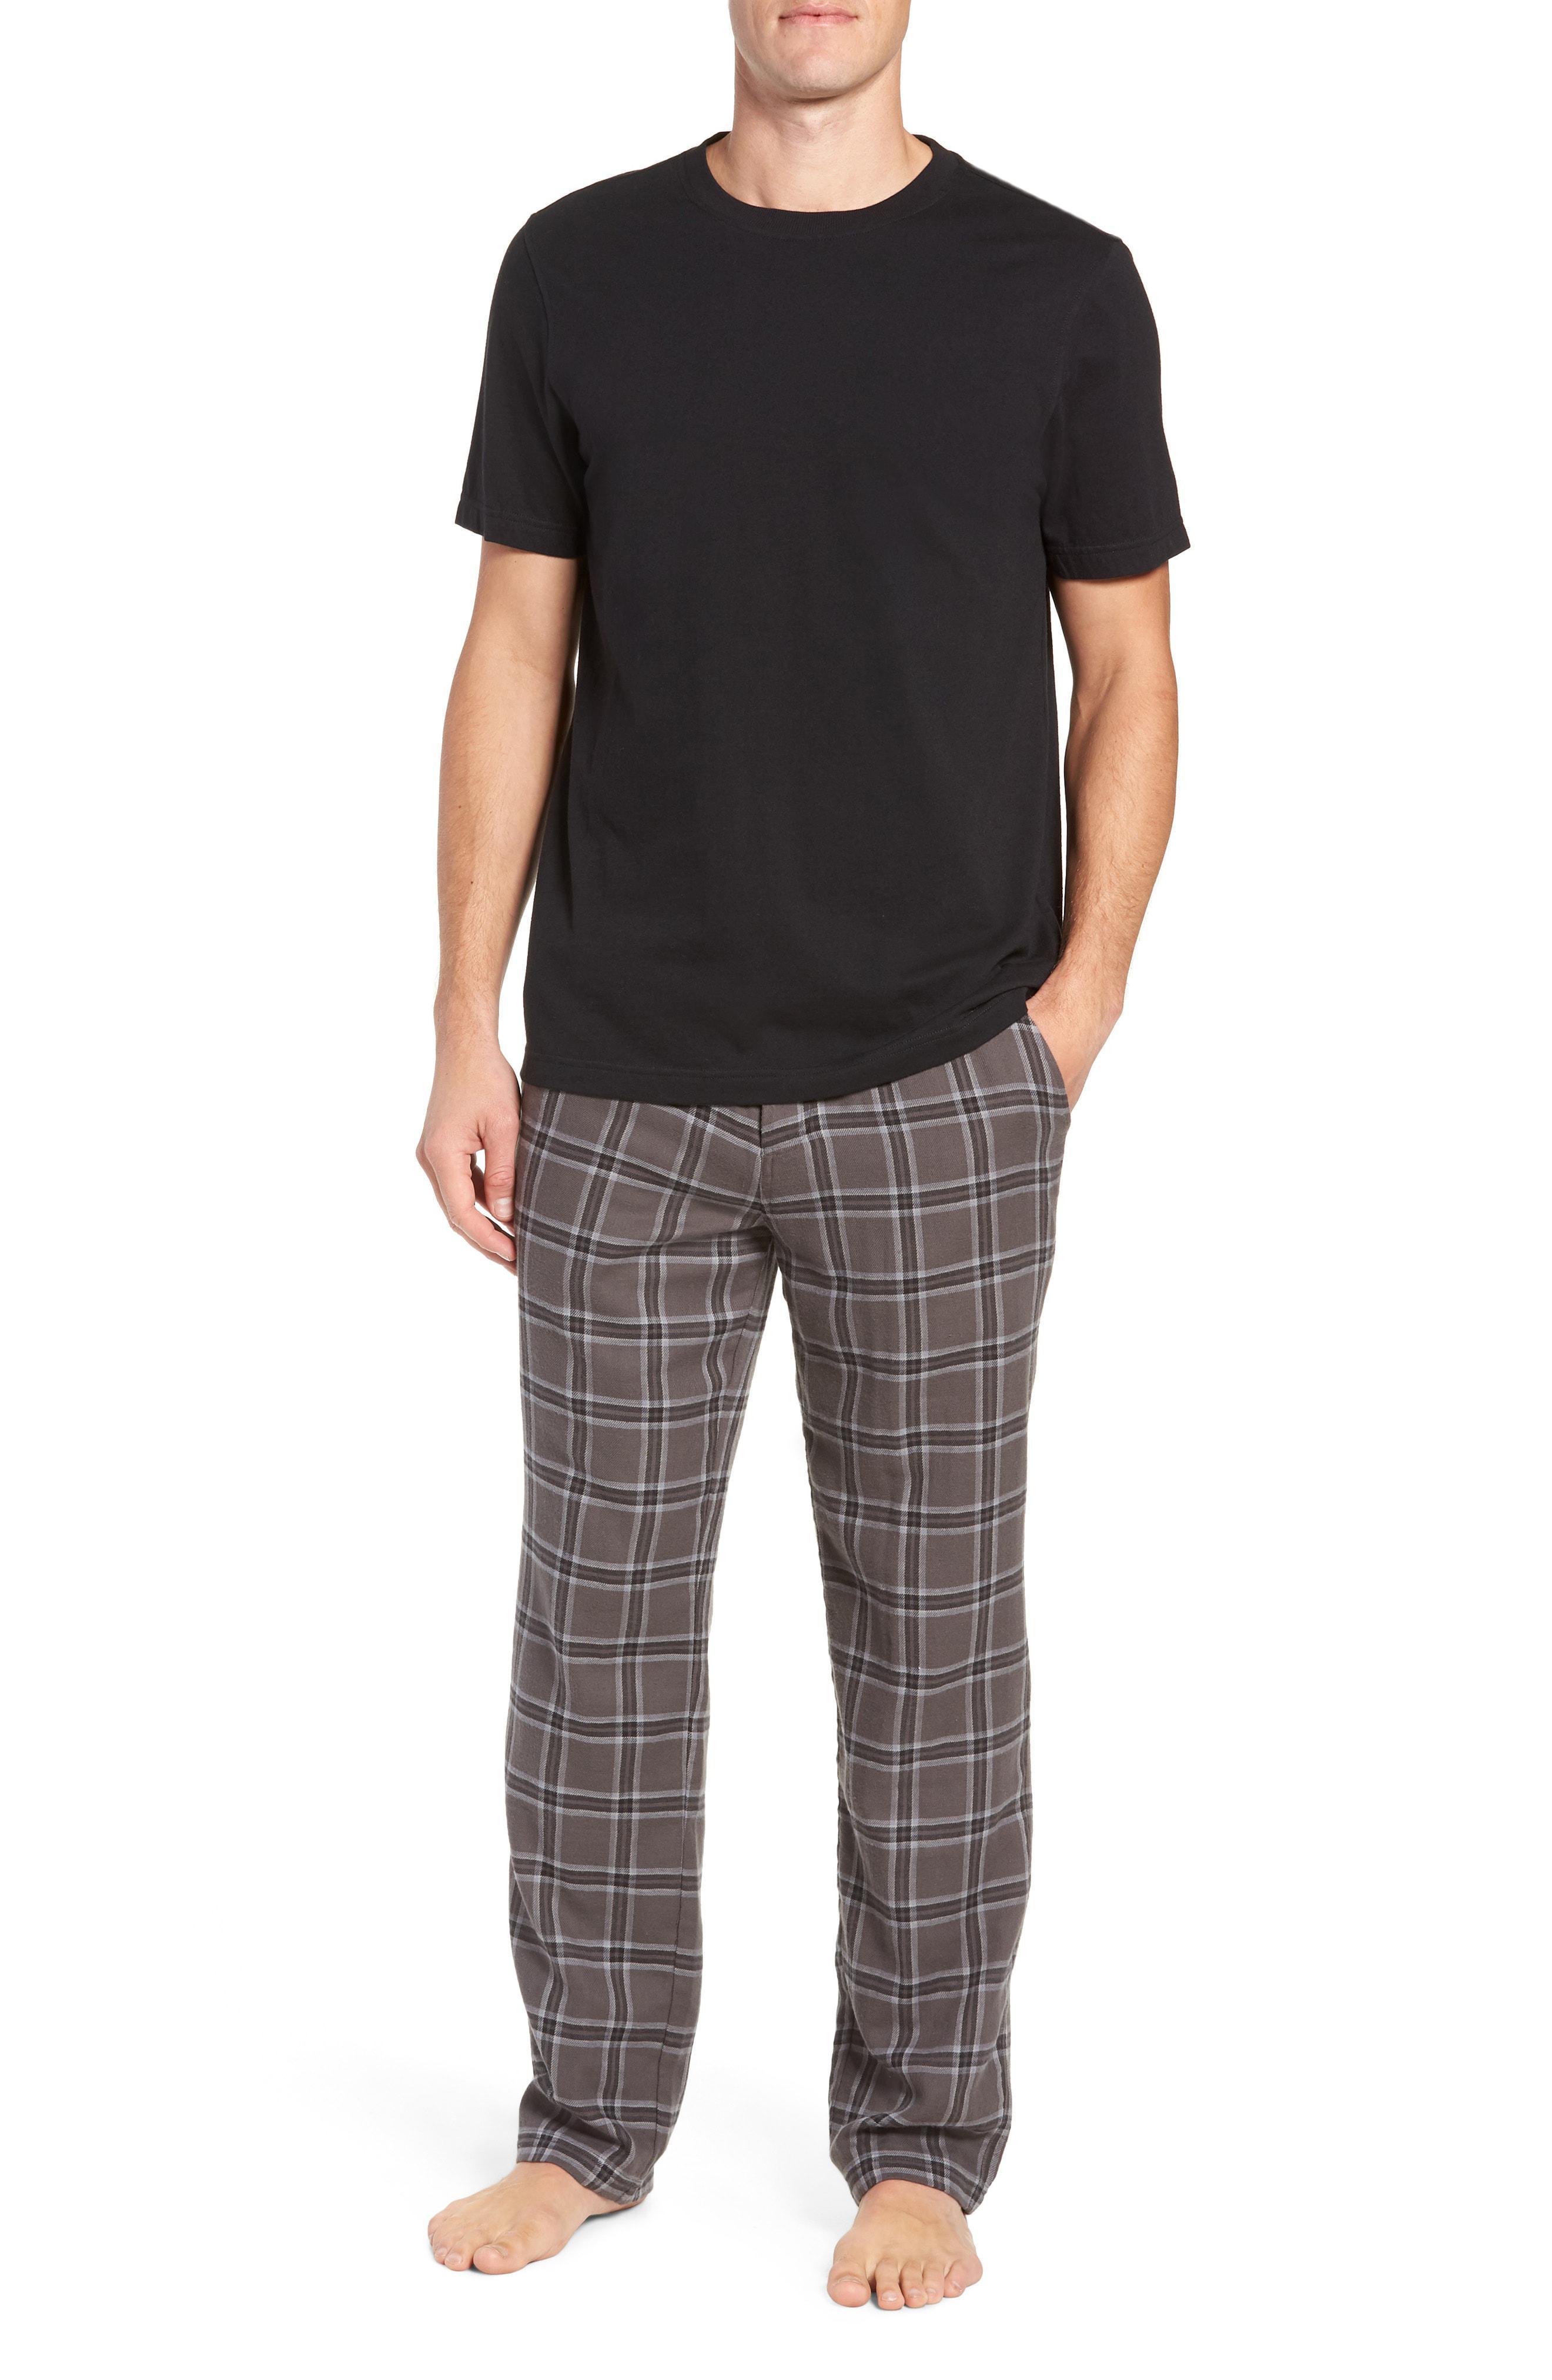 Lyst - Ugg Ugg Grant Pajama Set in Black for Men 598aaeb4c